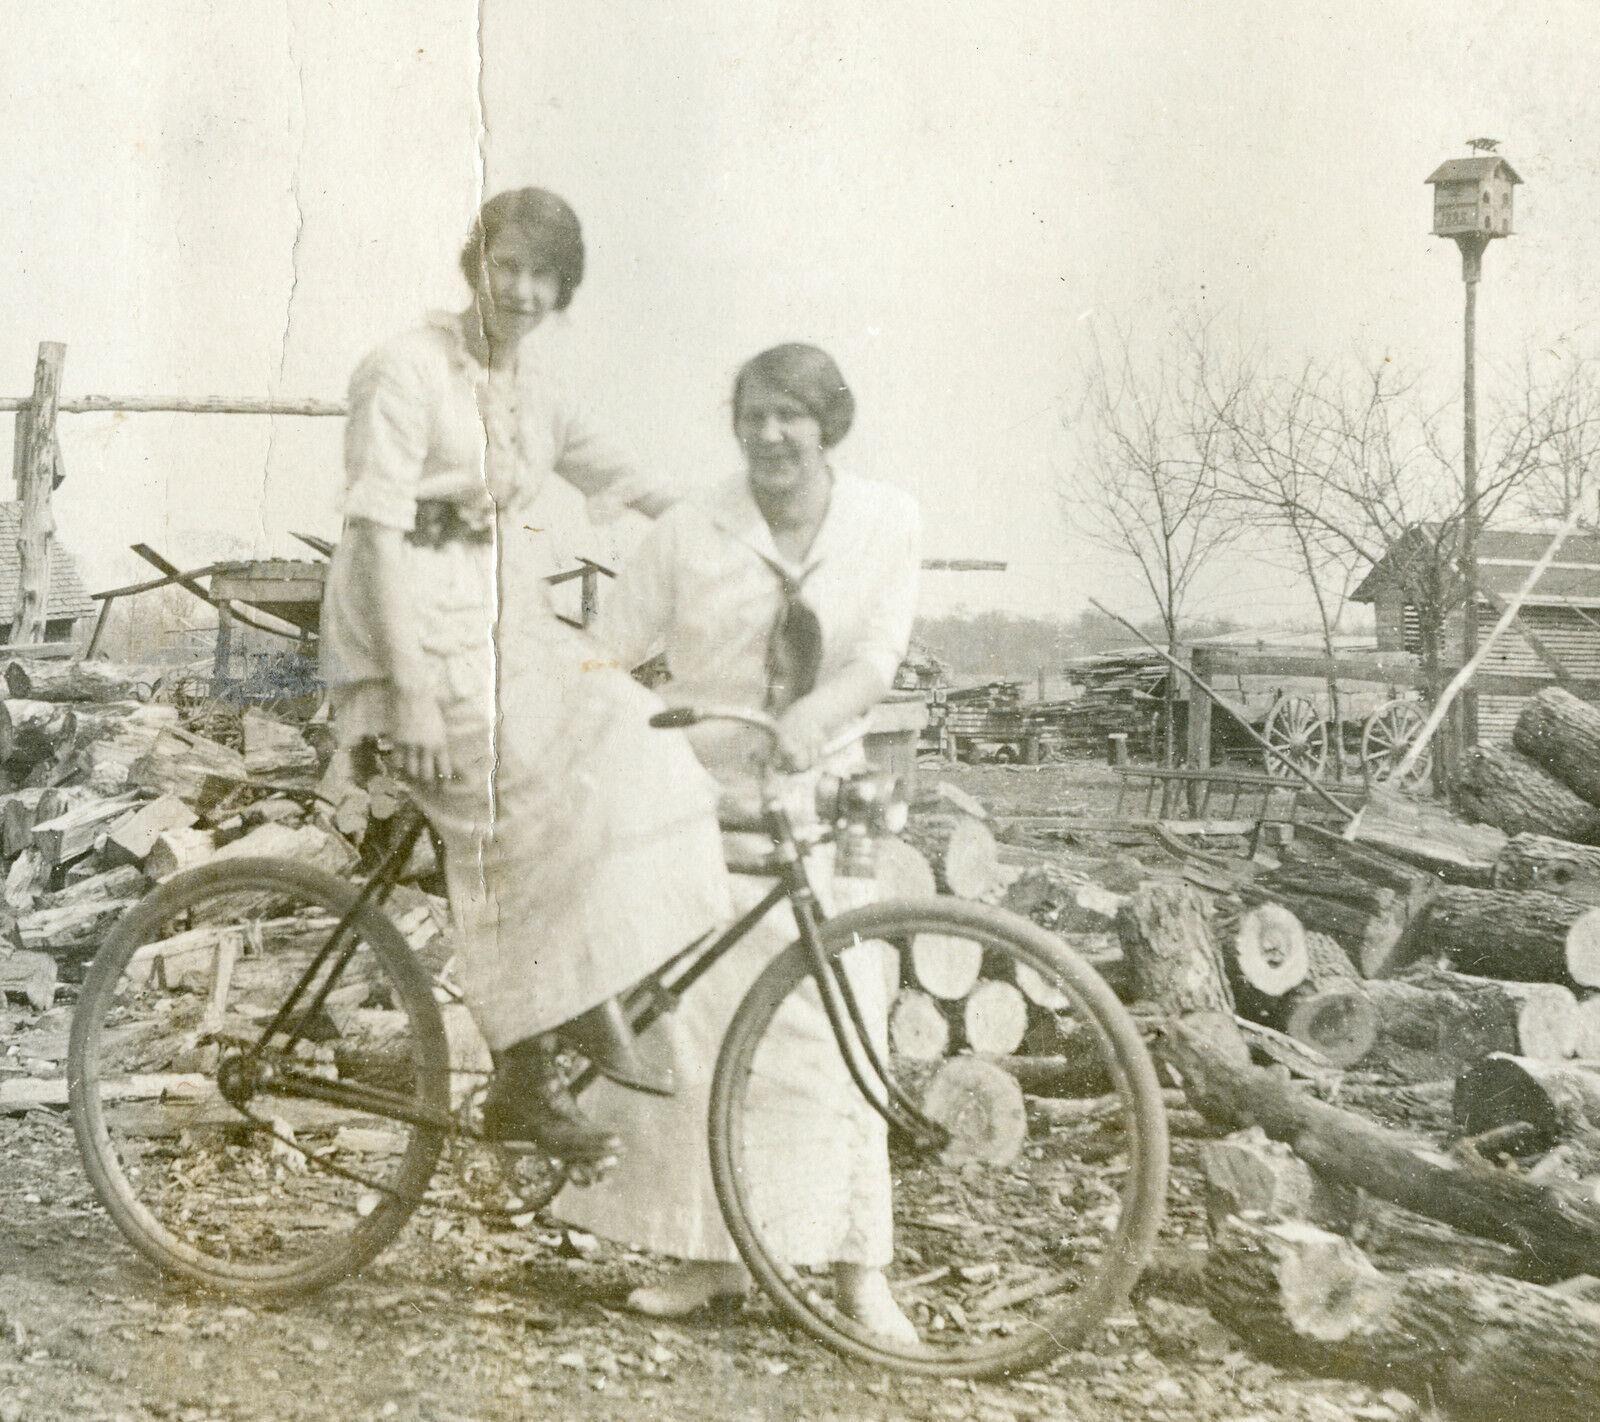 Antique VINTAGE AMERICAN FOLK ART BIRDHOUSE WEATHERVANE 1888 BIKE LIGHT PHOTO   [ ]